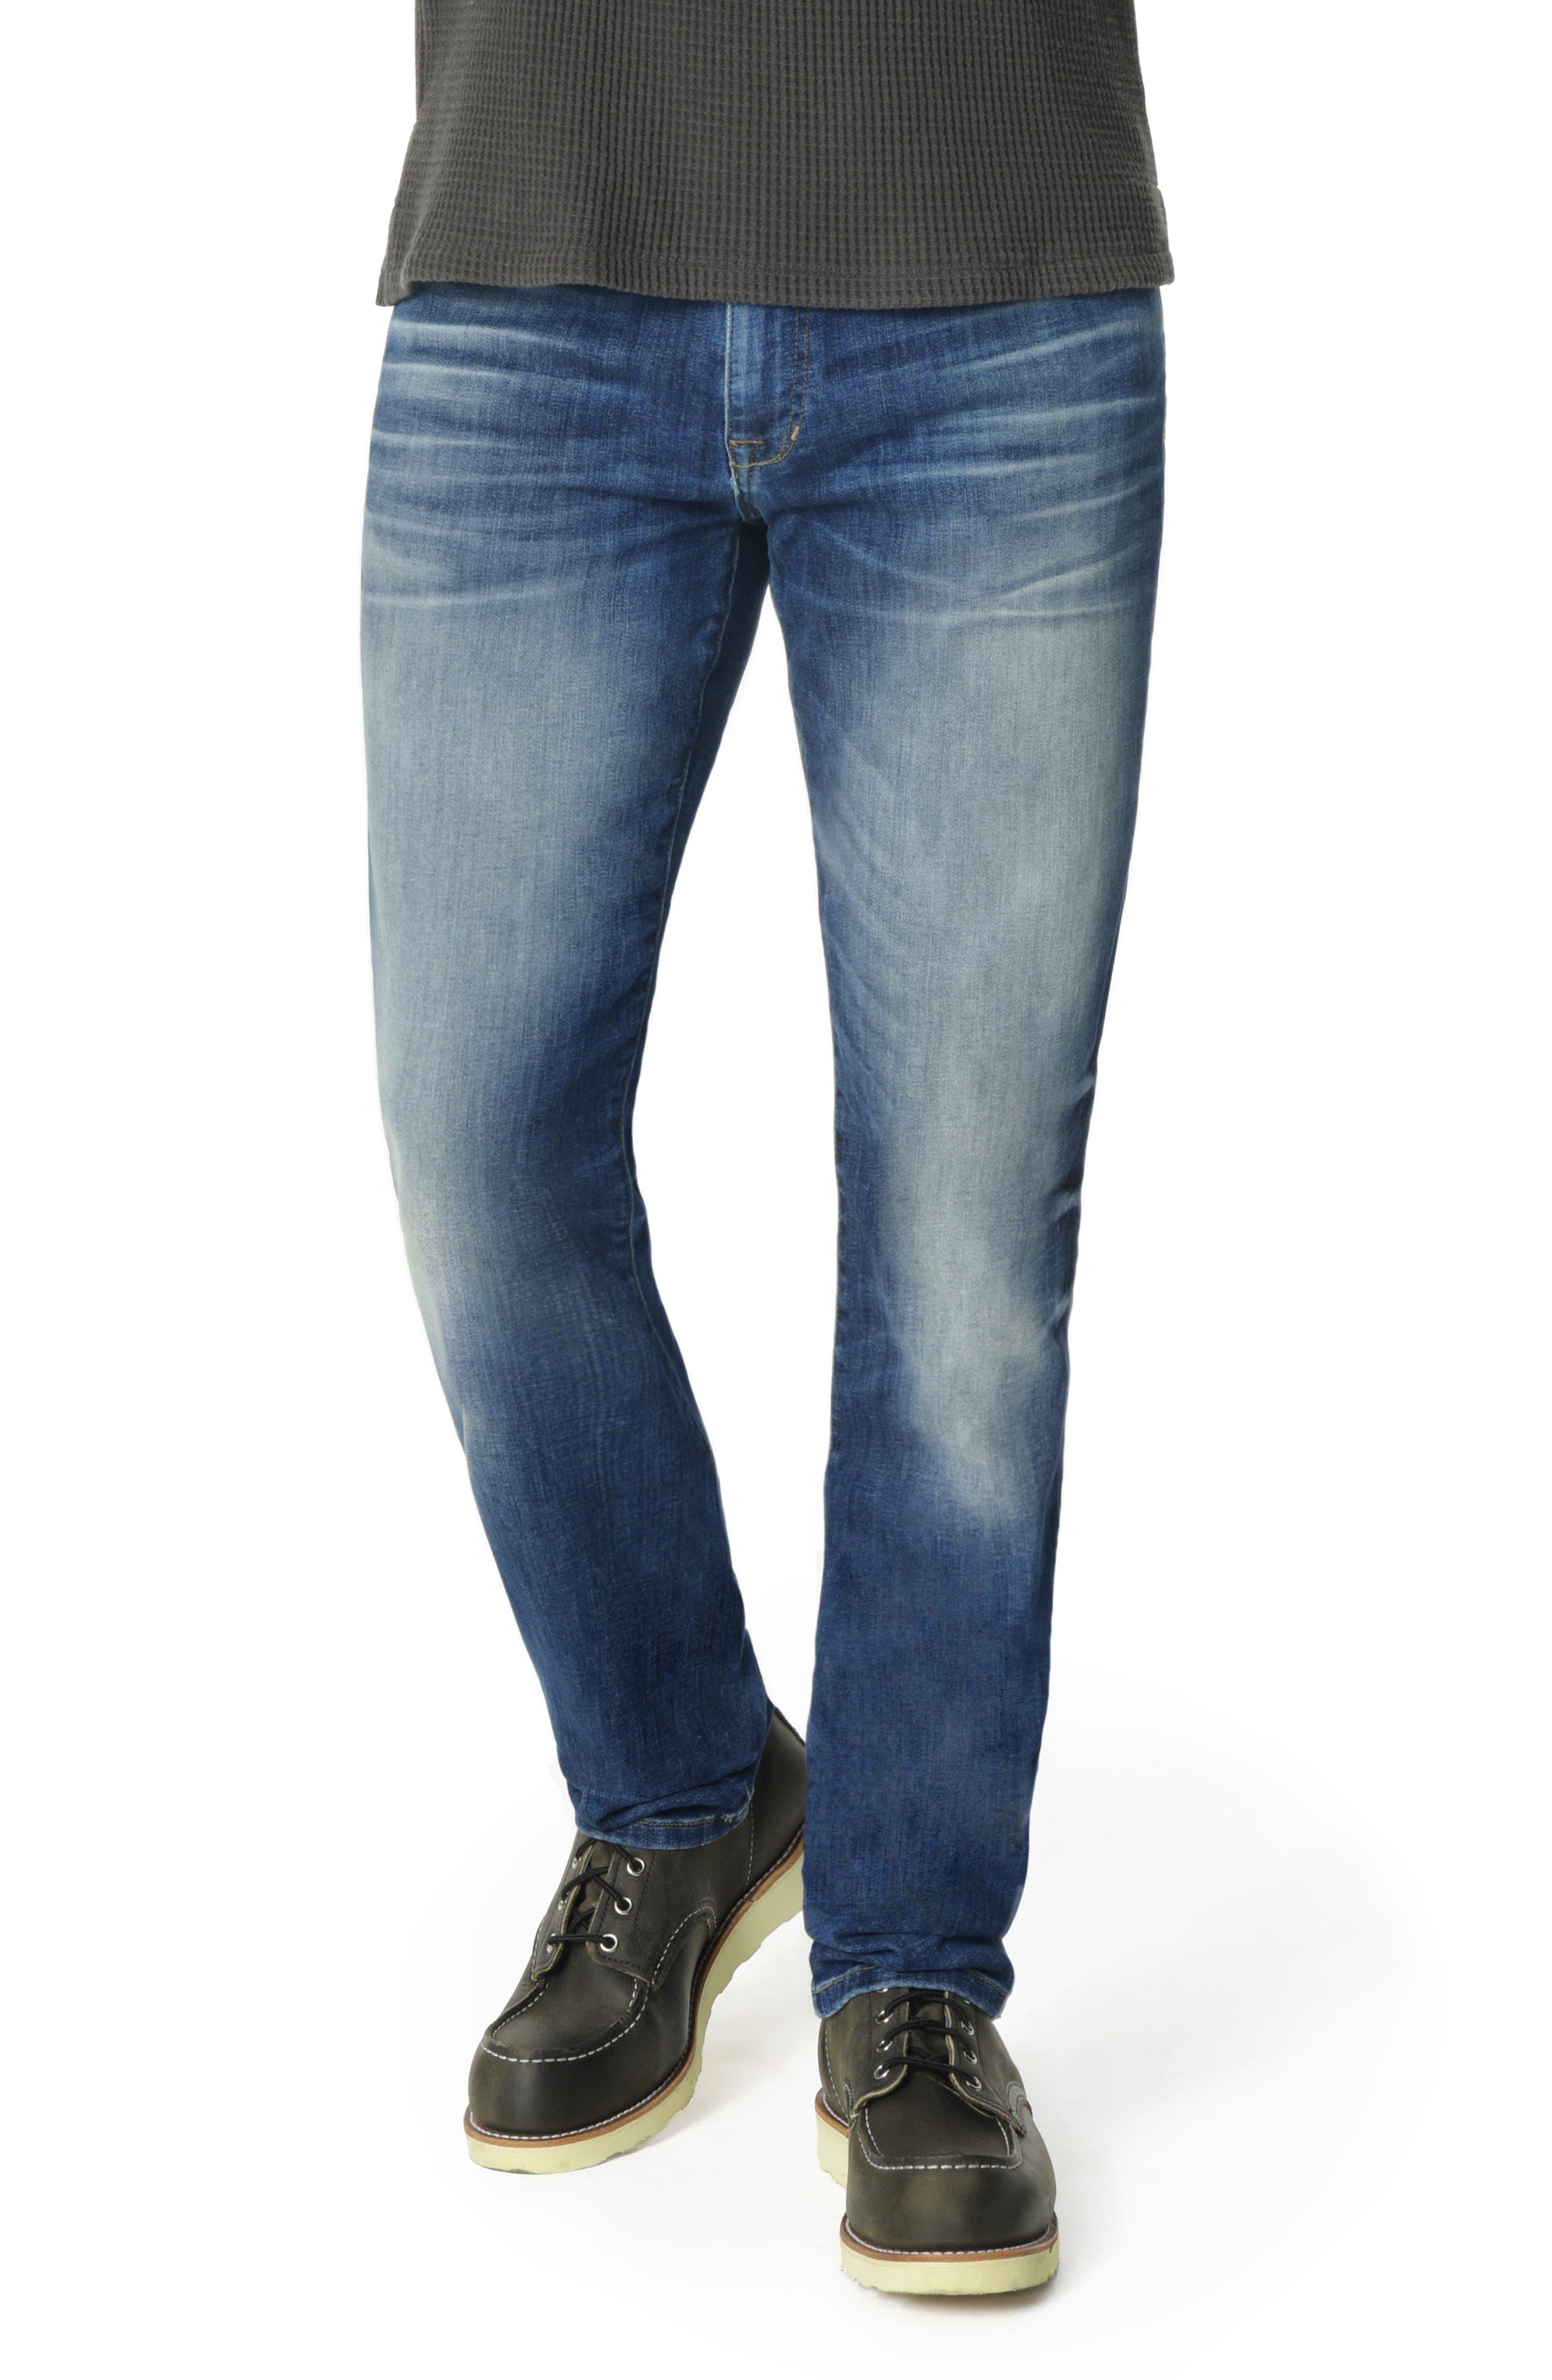 JOE'S,                             Brixton Slim Straight Leg Jeans,                             Main thumbnail 1, color,                             HOYT